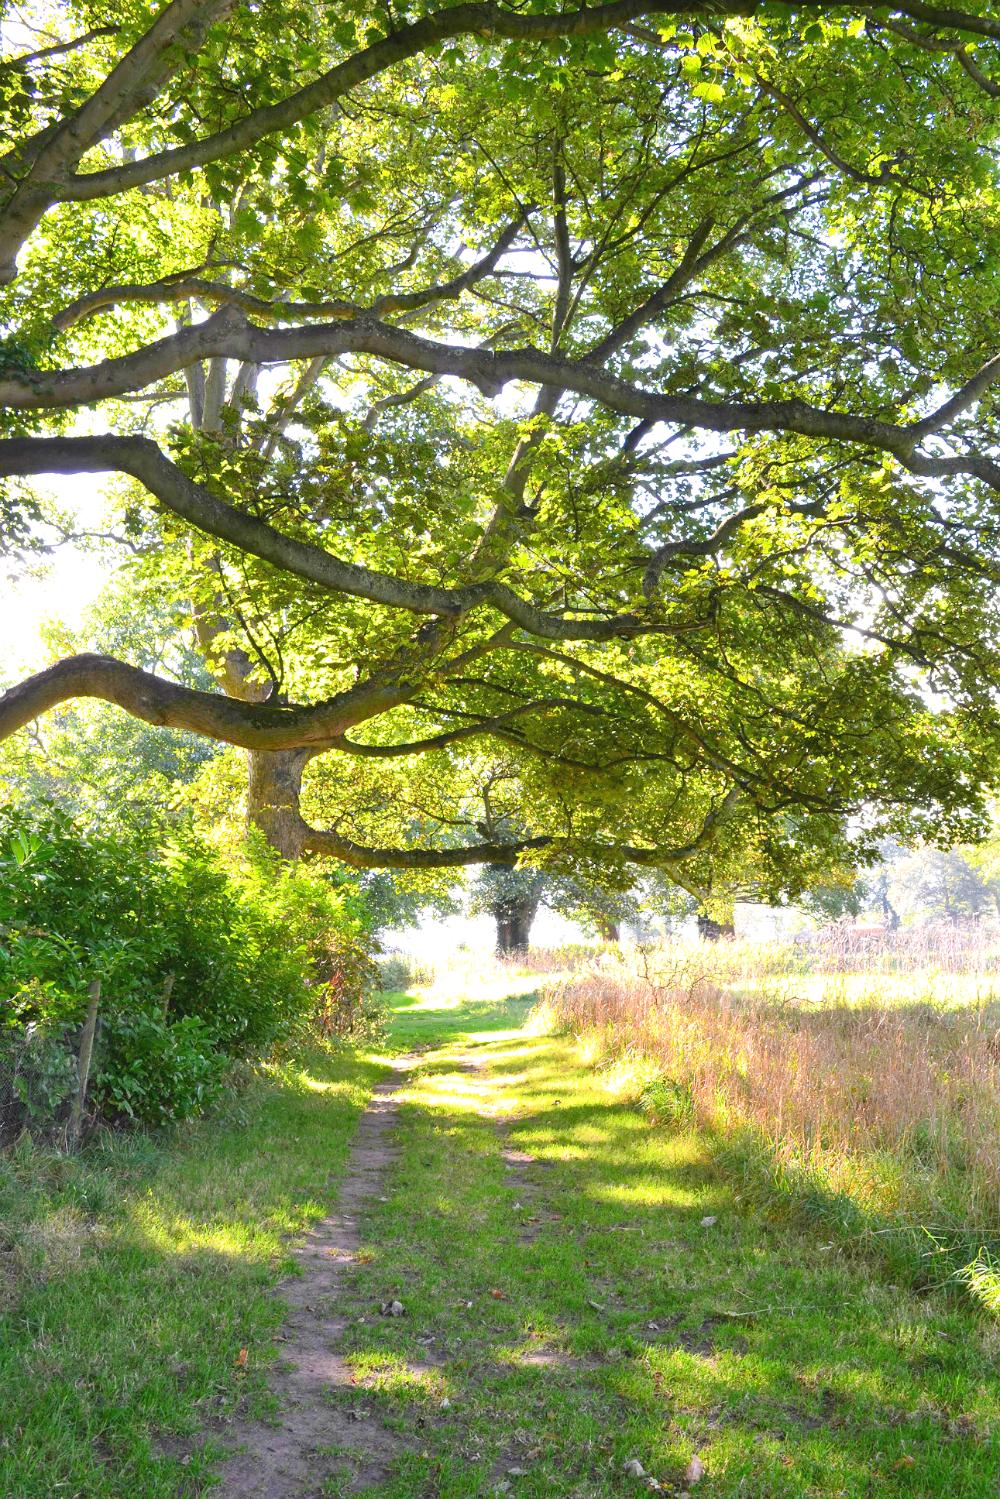 The Ordinary Lovely: Six Feet A Walking